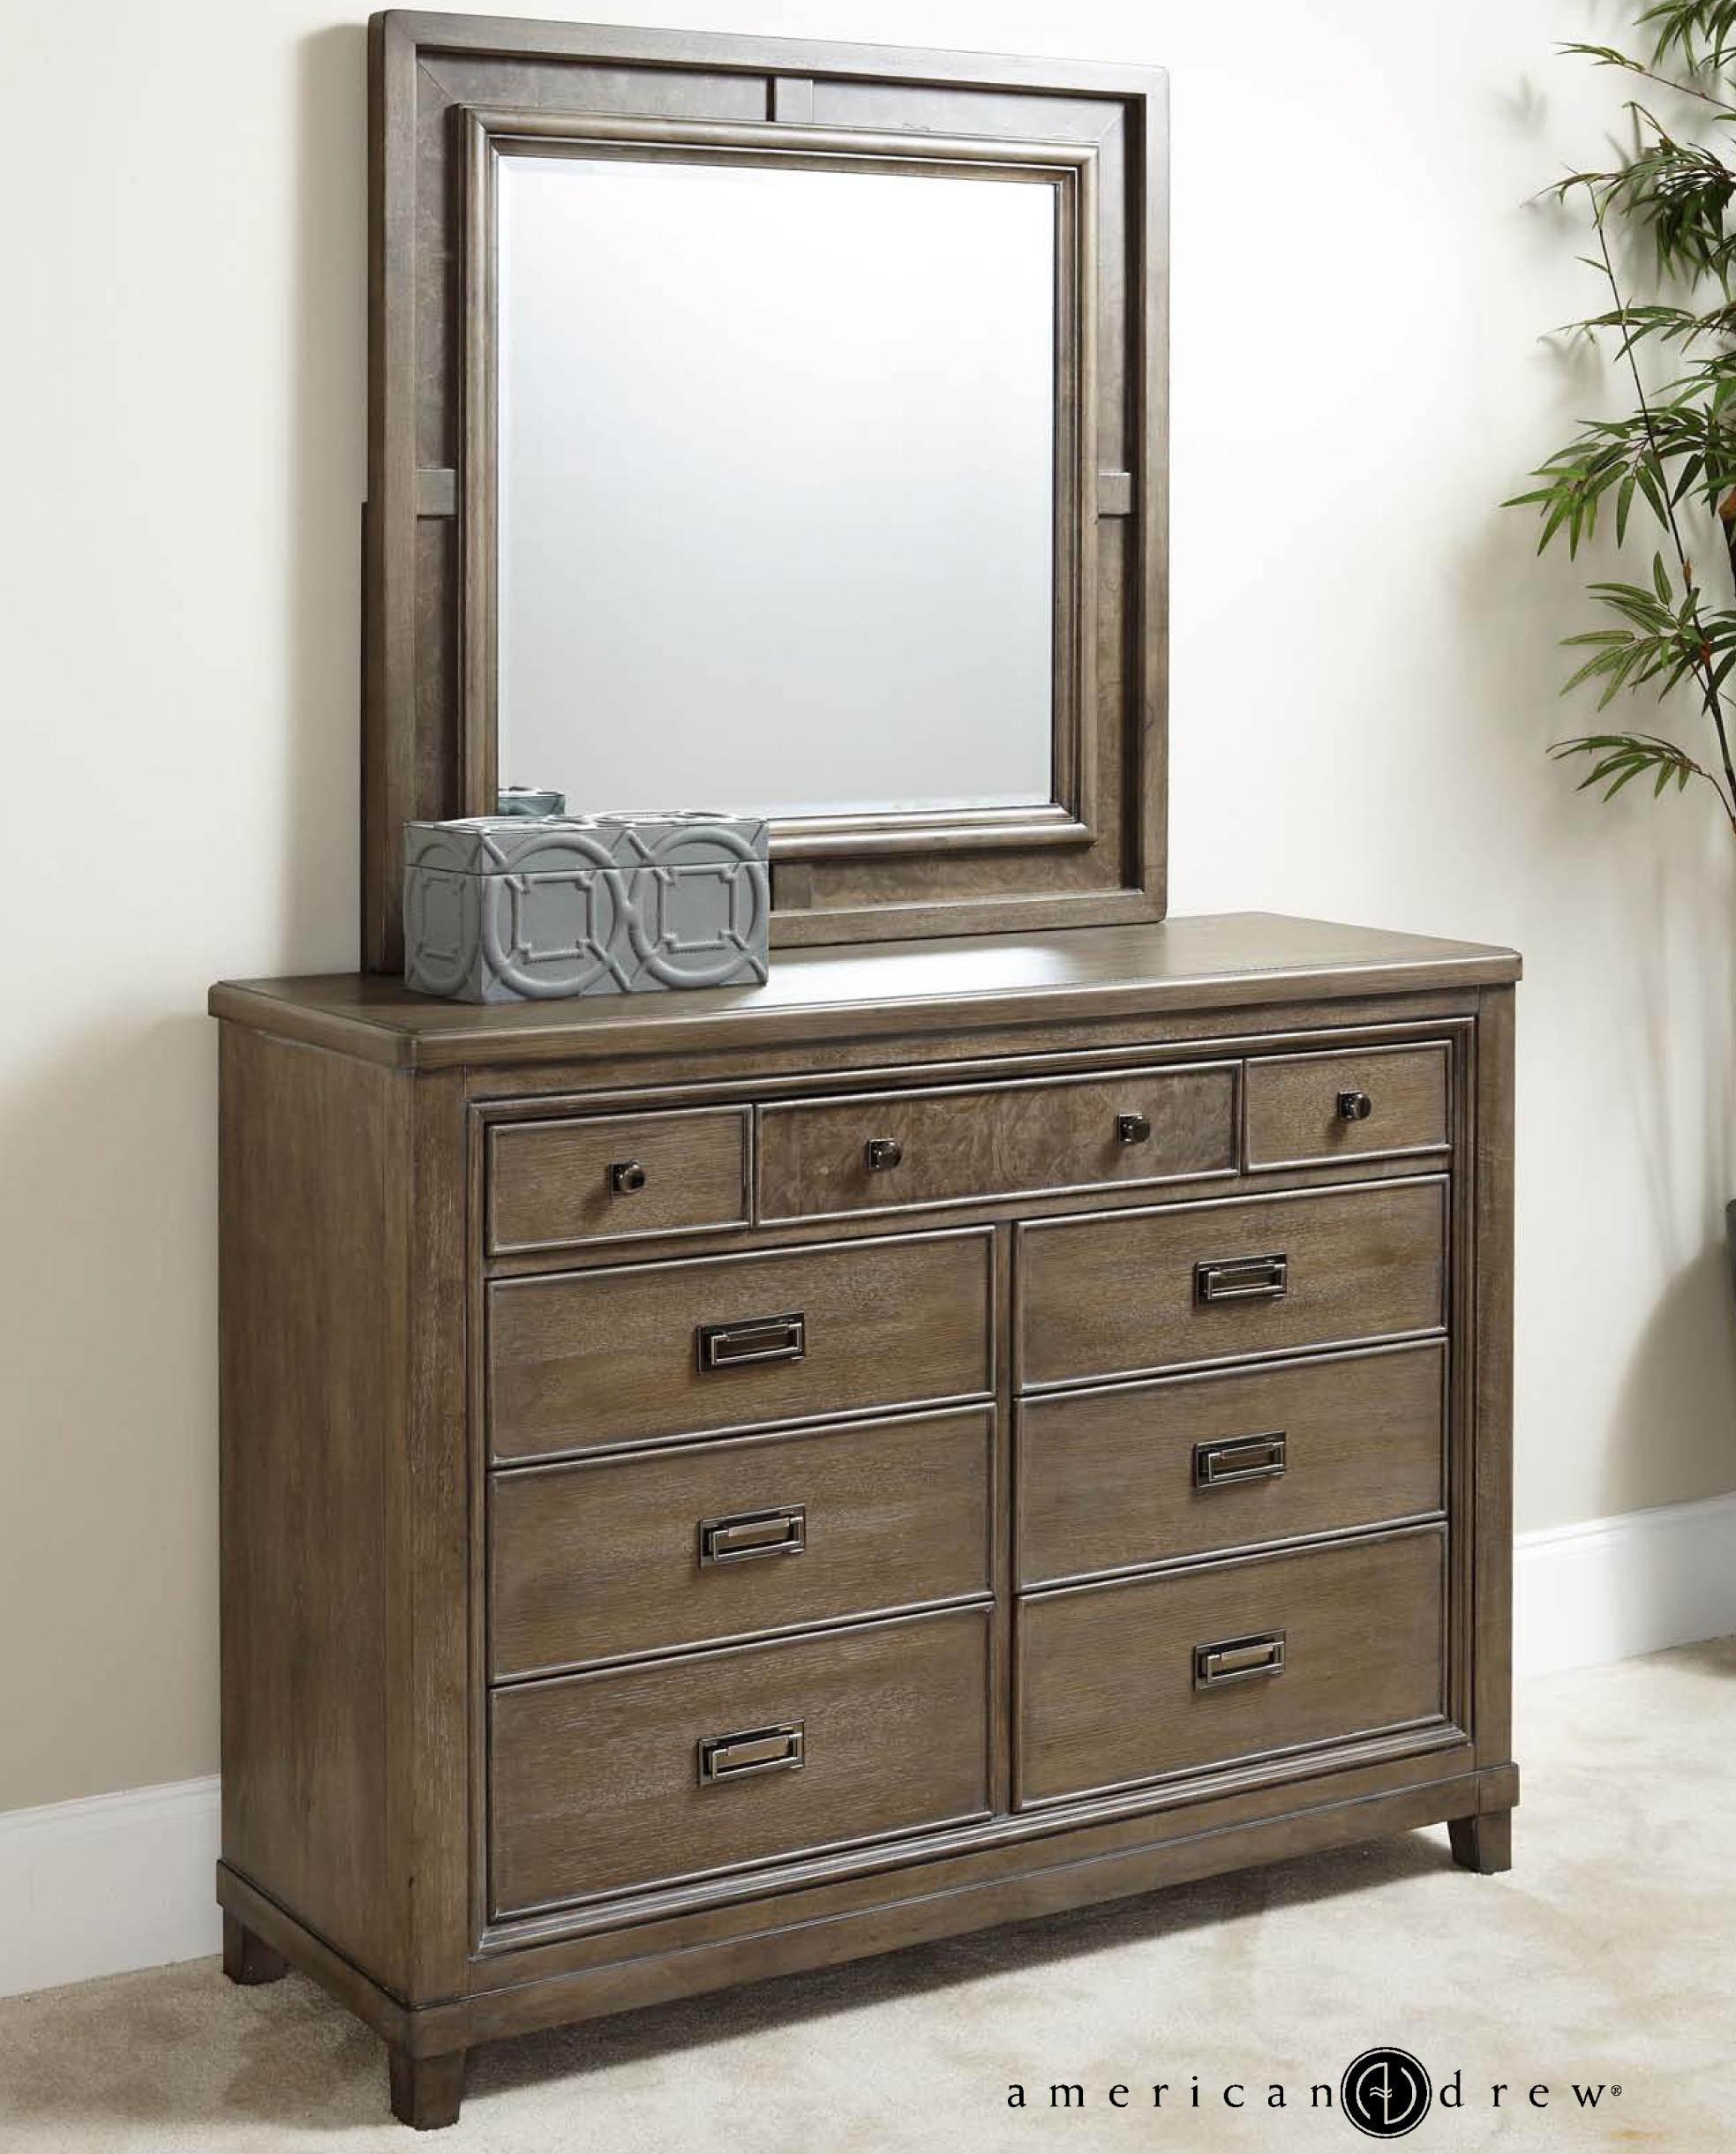 American Drew Park Studio Dresser and Mirror Set - Item Number: 488-030+131